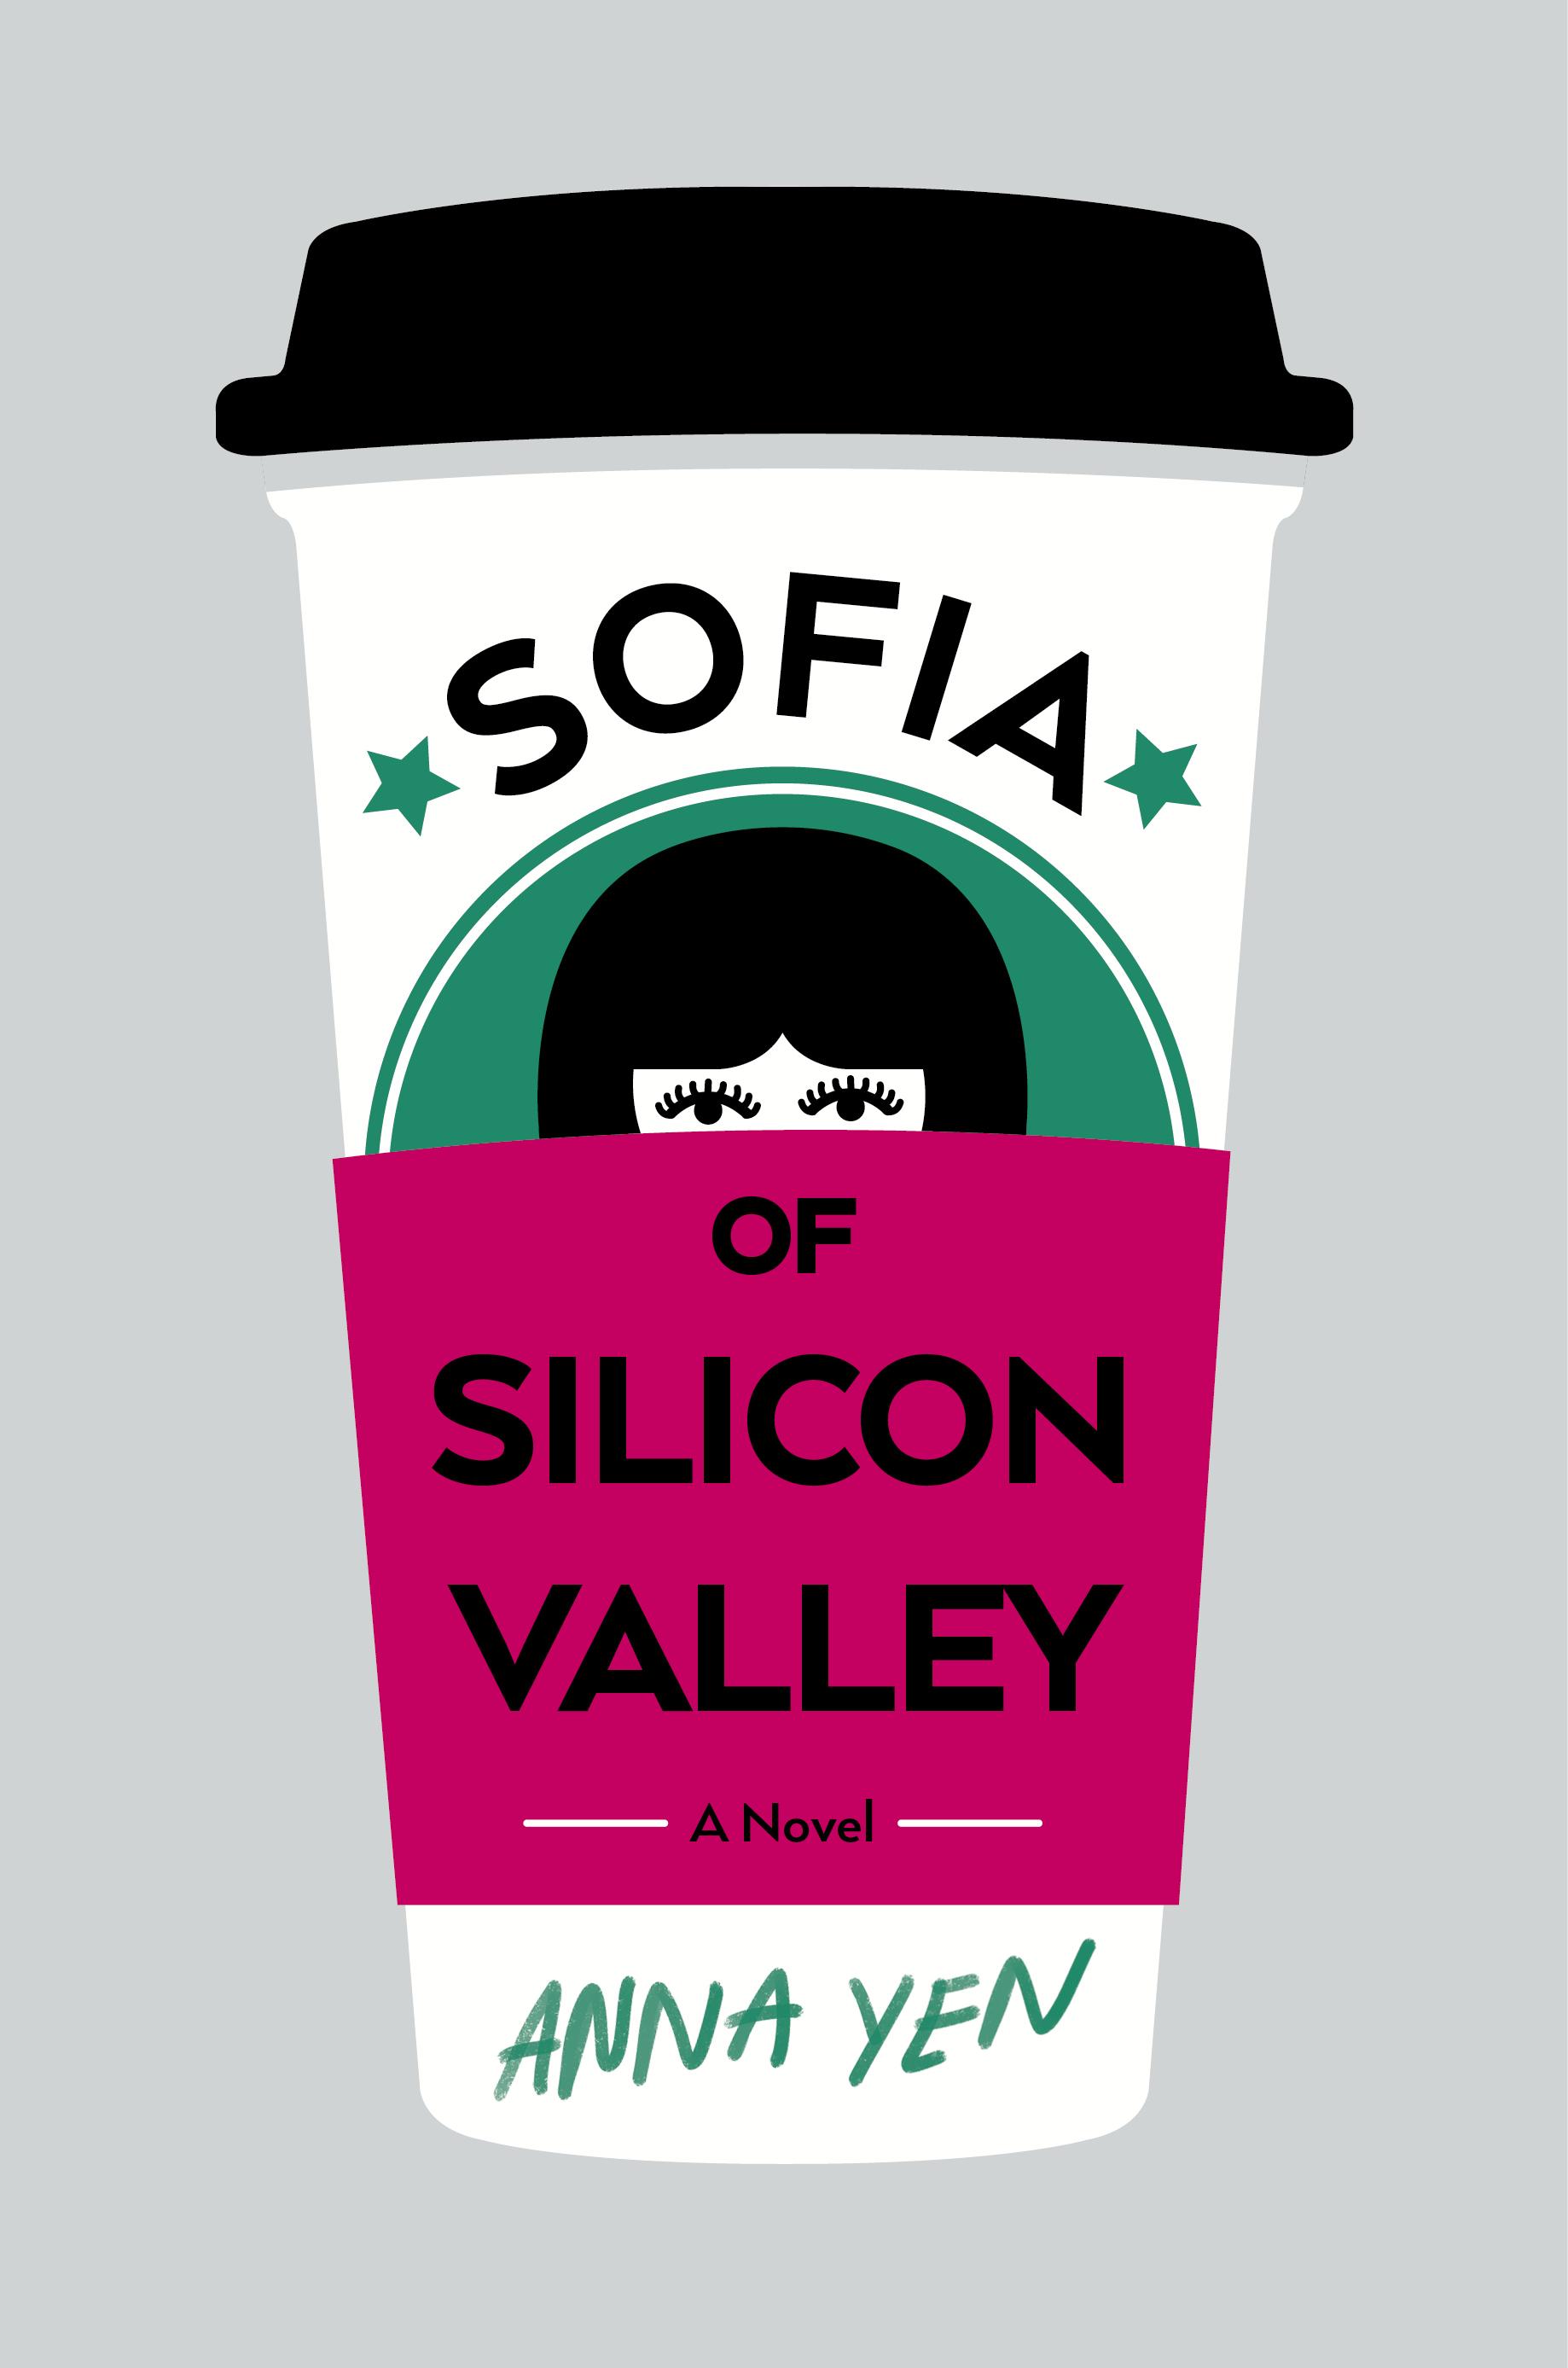 Sofia of Silcon Valley4.jpg